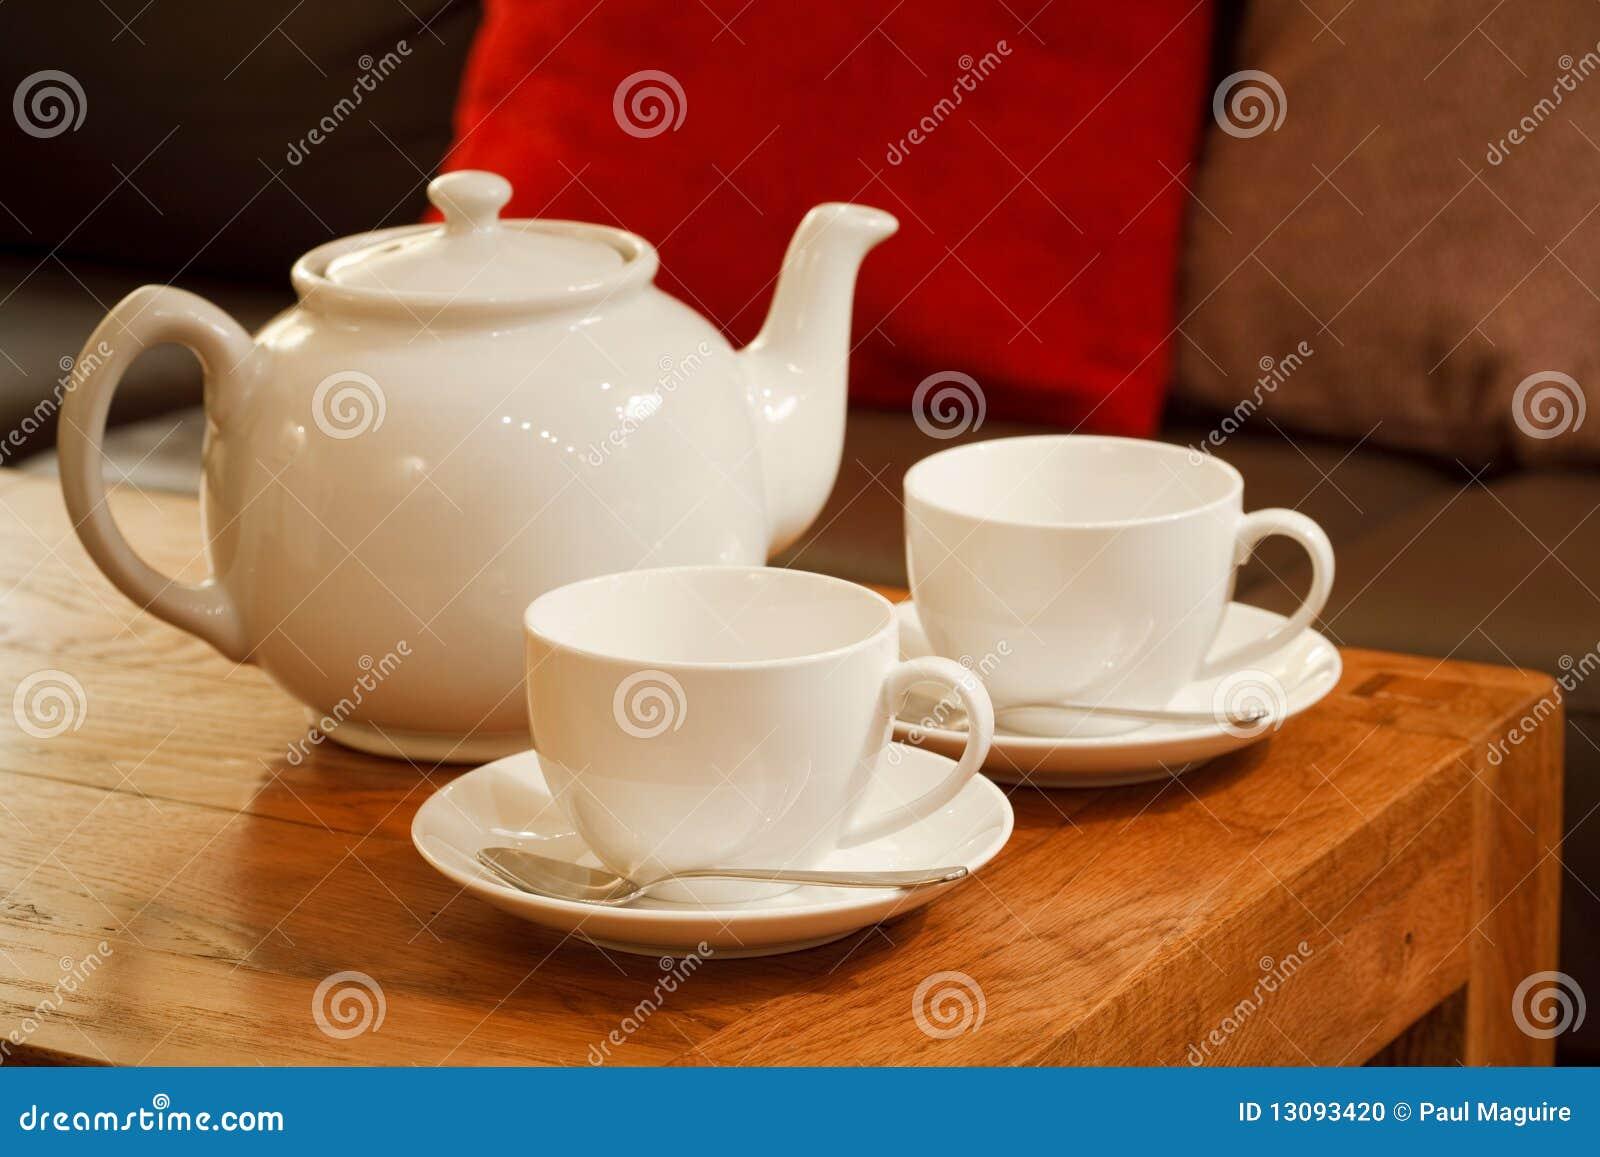 english tea stock photo image 13093420. Black Bedroom Furniture Sets. Home Design Ideas